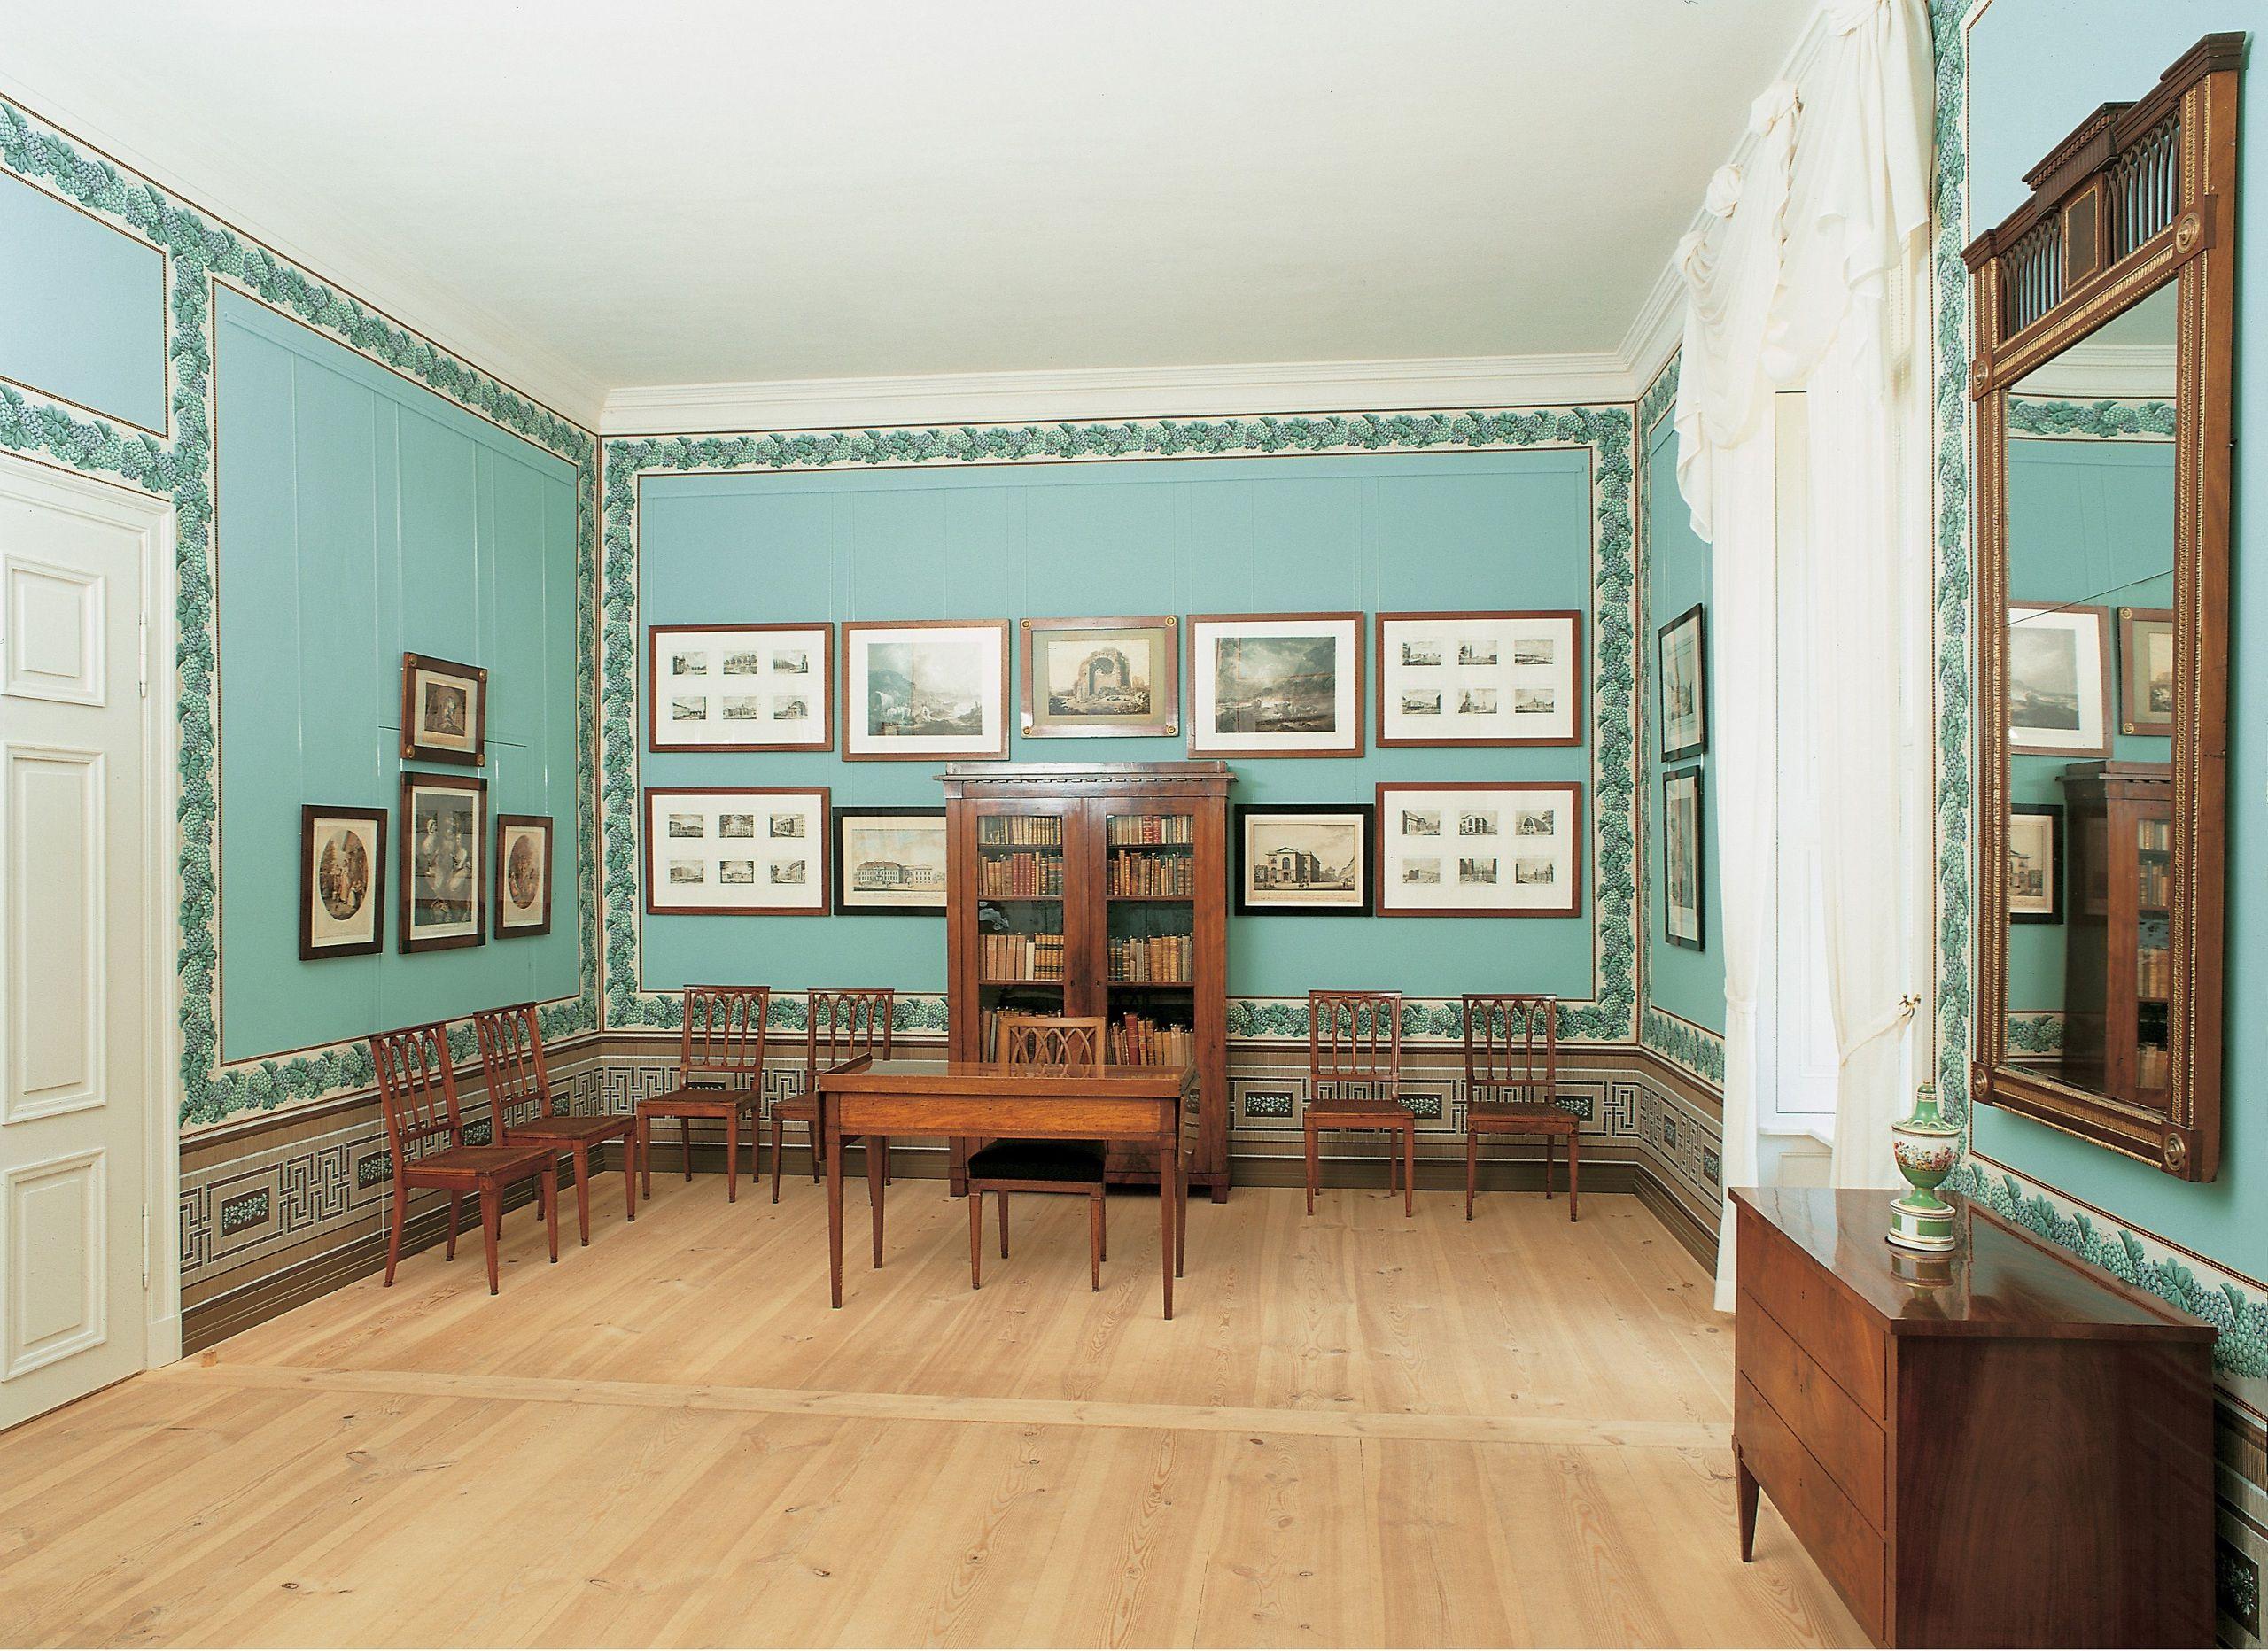 Design arbeitszimmer ~ Schloss paretz arbeitszimmer des königs foto spsg wolfgang